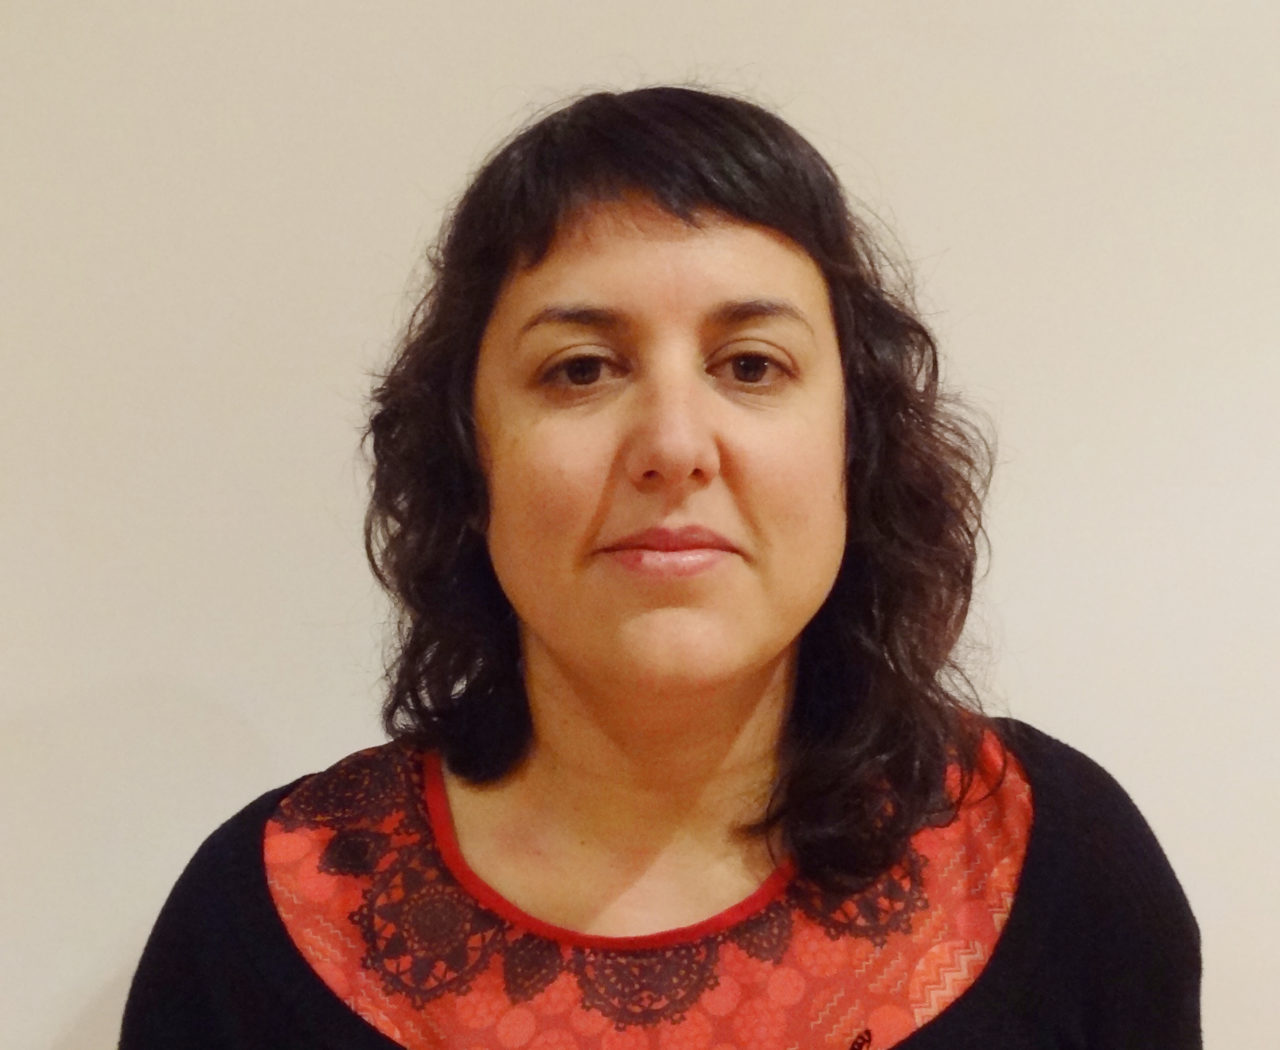 Patricia Calvo Maroto